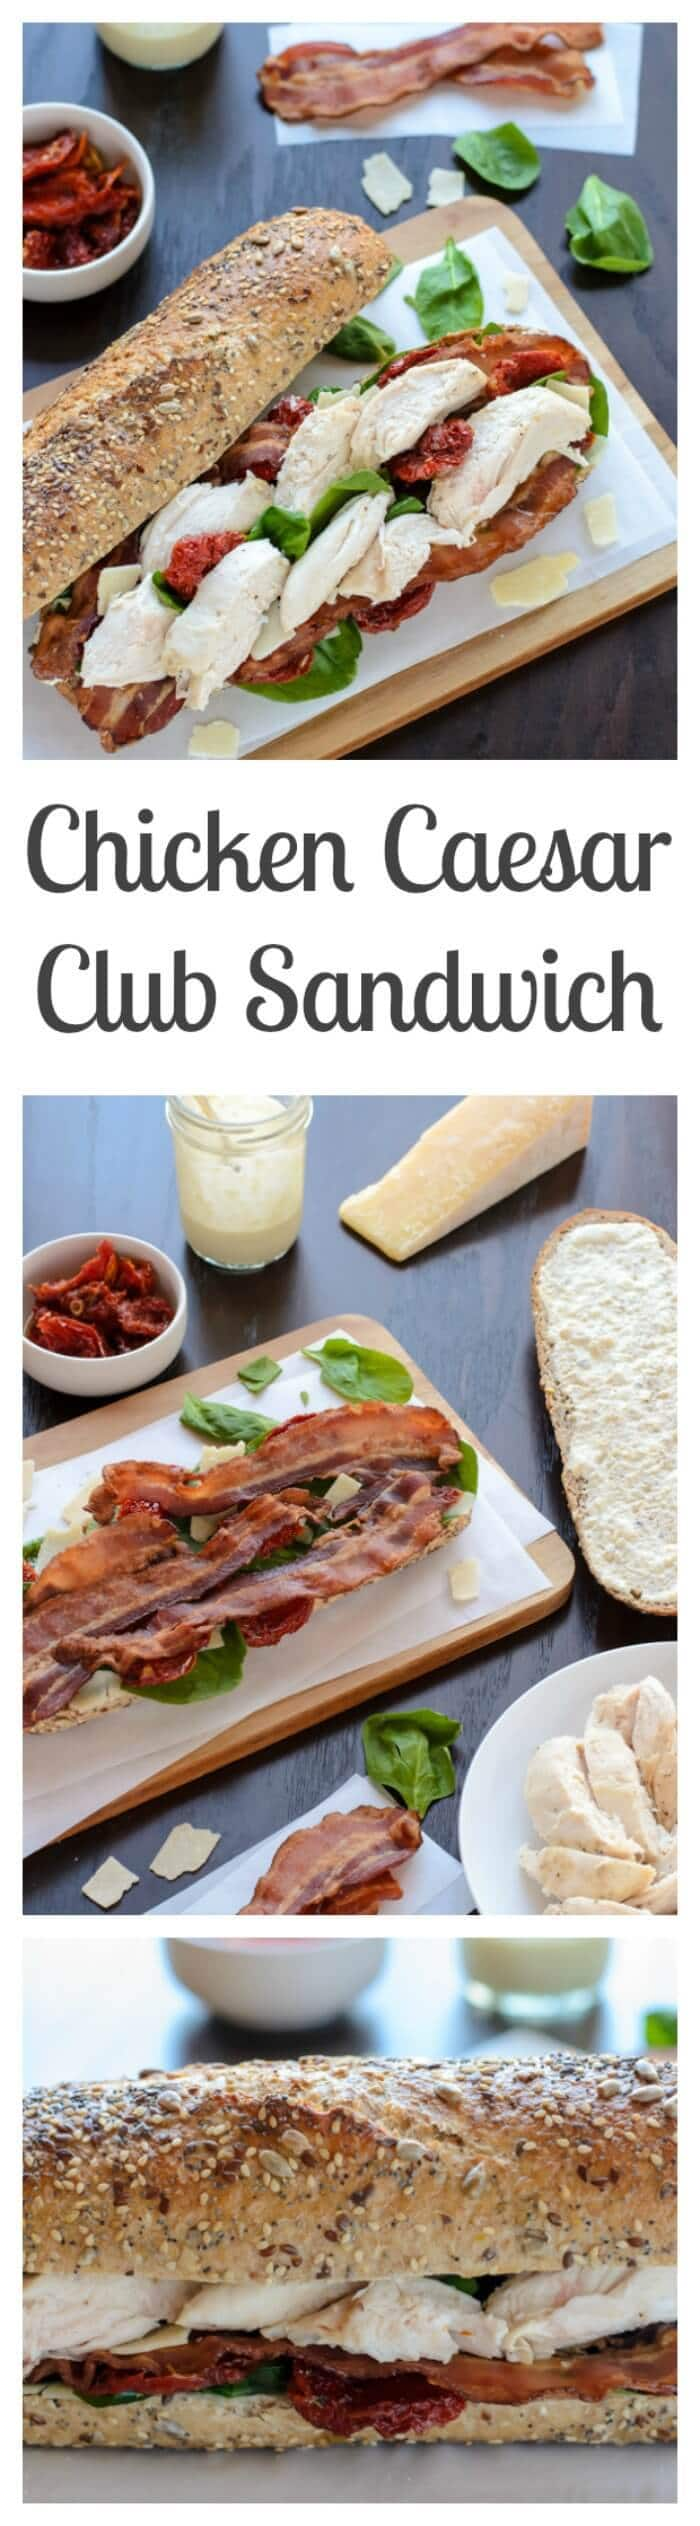 Chicken Caesar Club Sandwich with Bacon